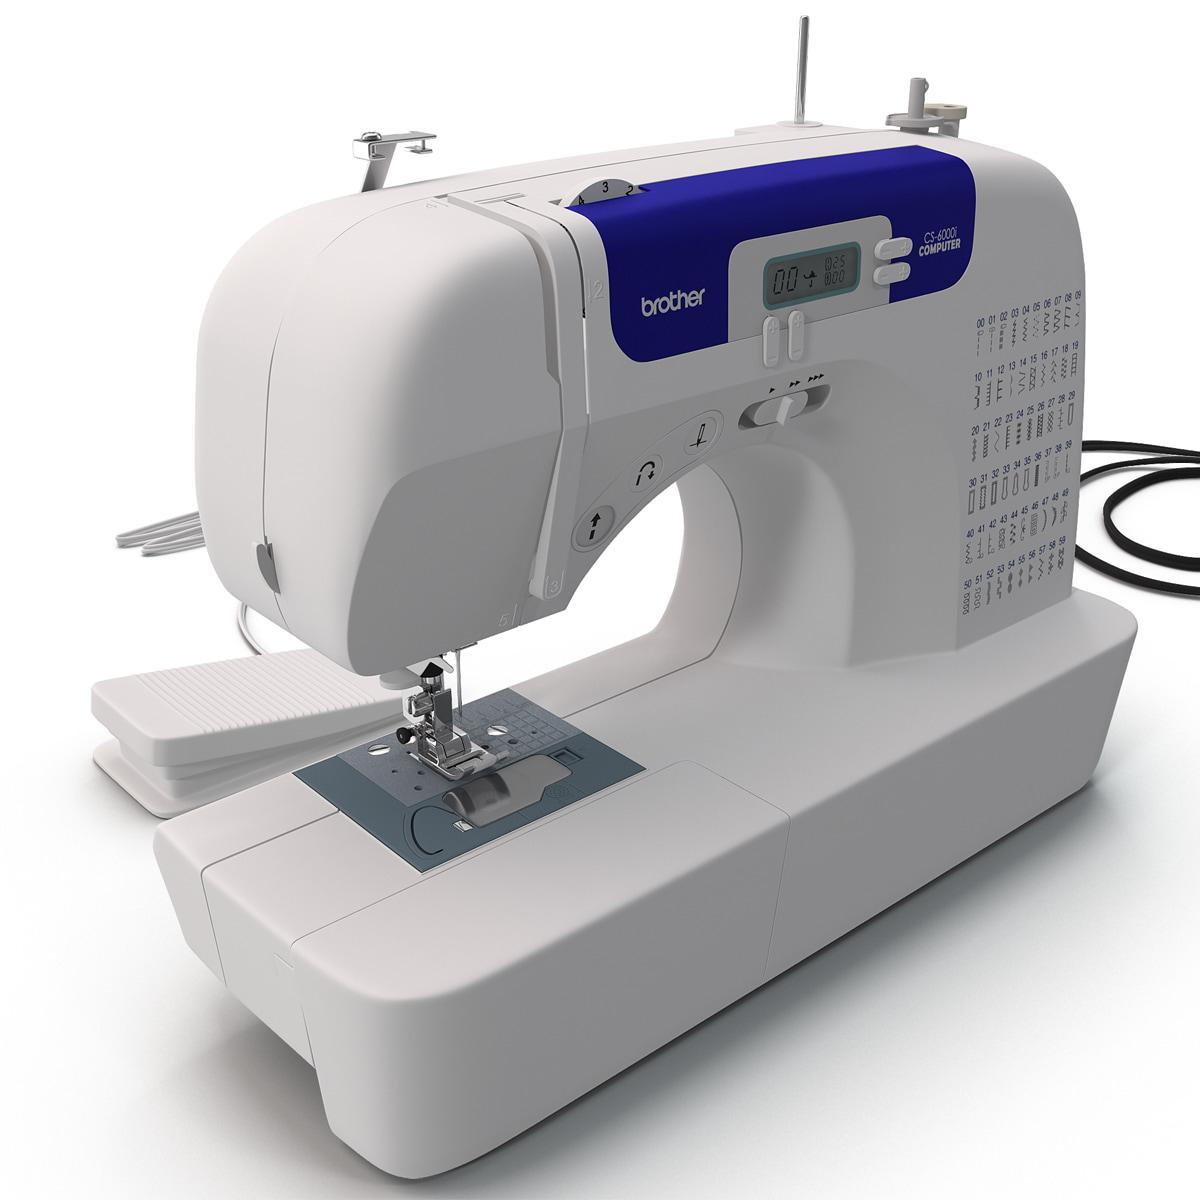 Sewing Machine Brother CS-6000i_8.jpg